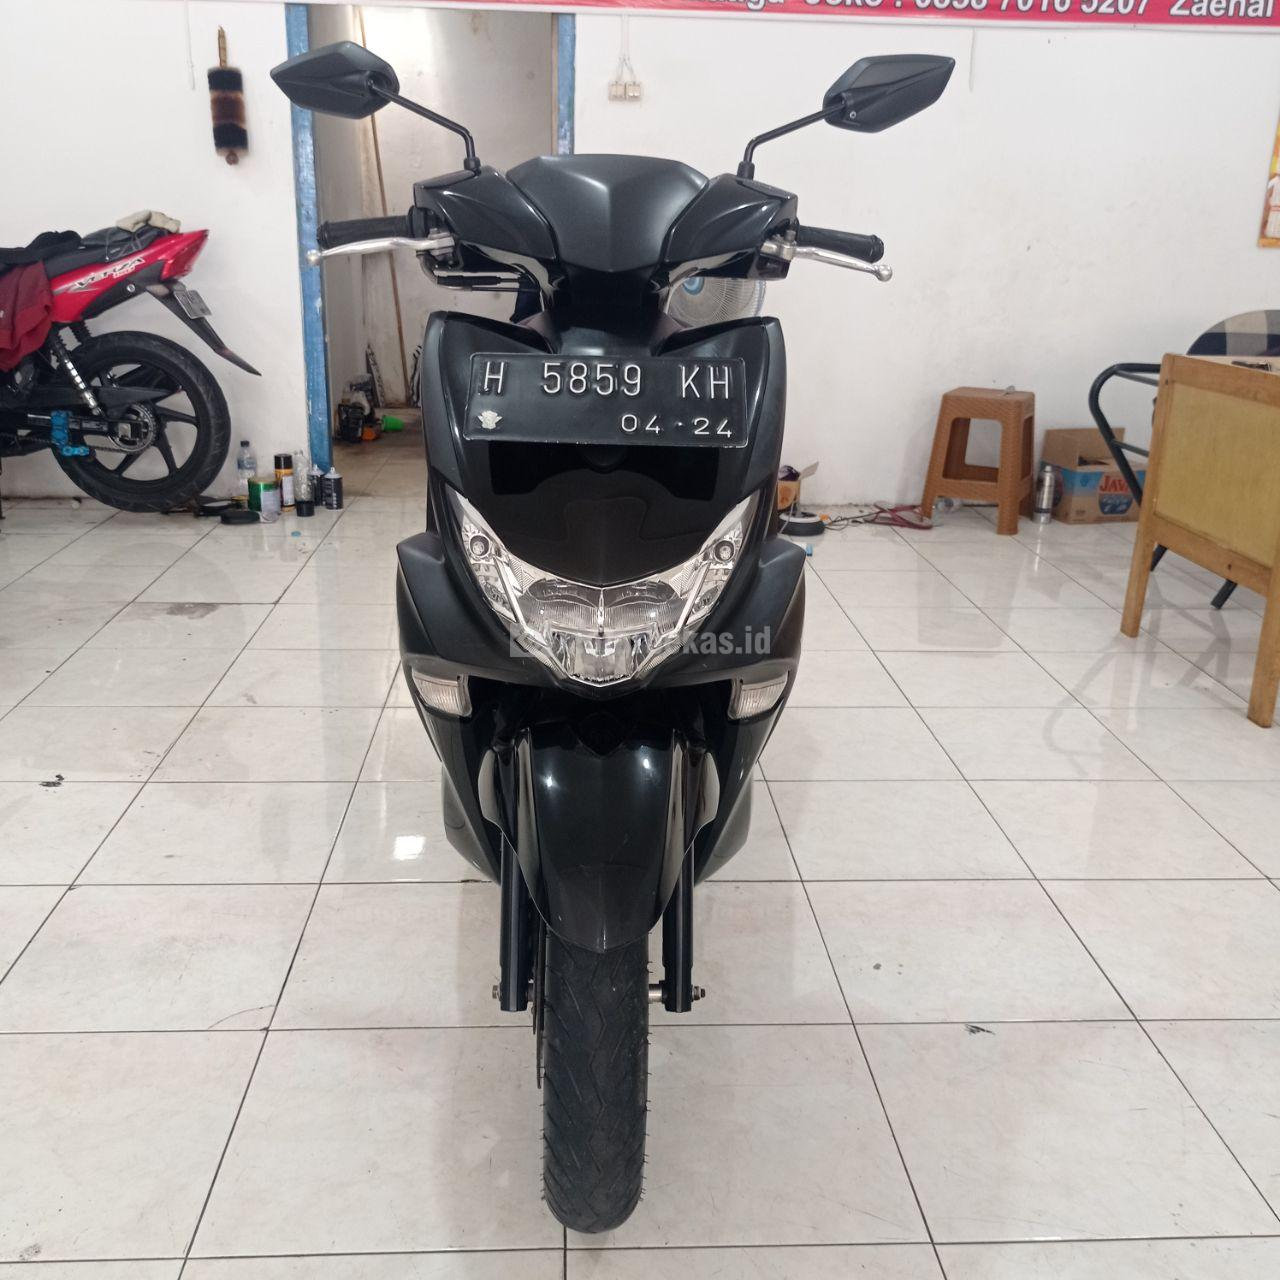 YAMAHA FREE GO  786 motorbekas.id